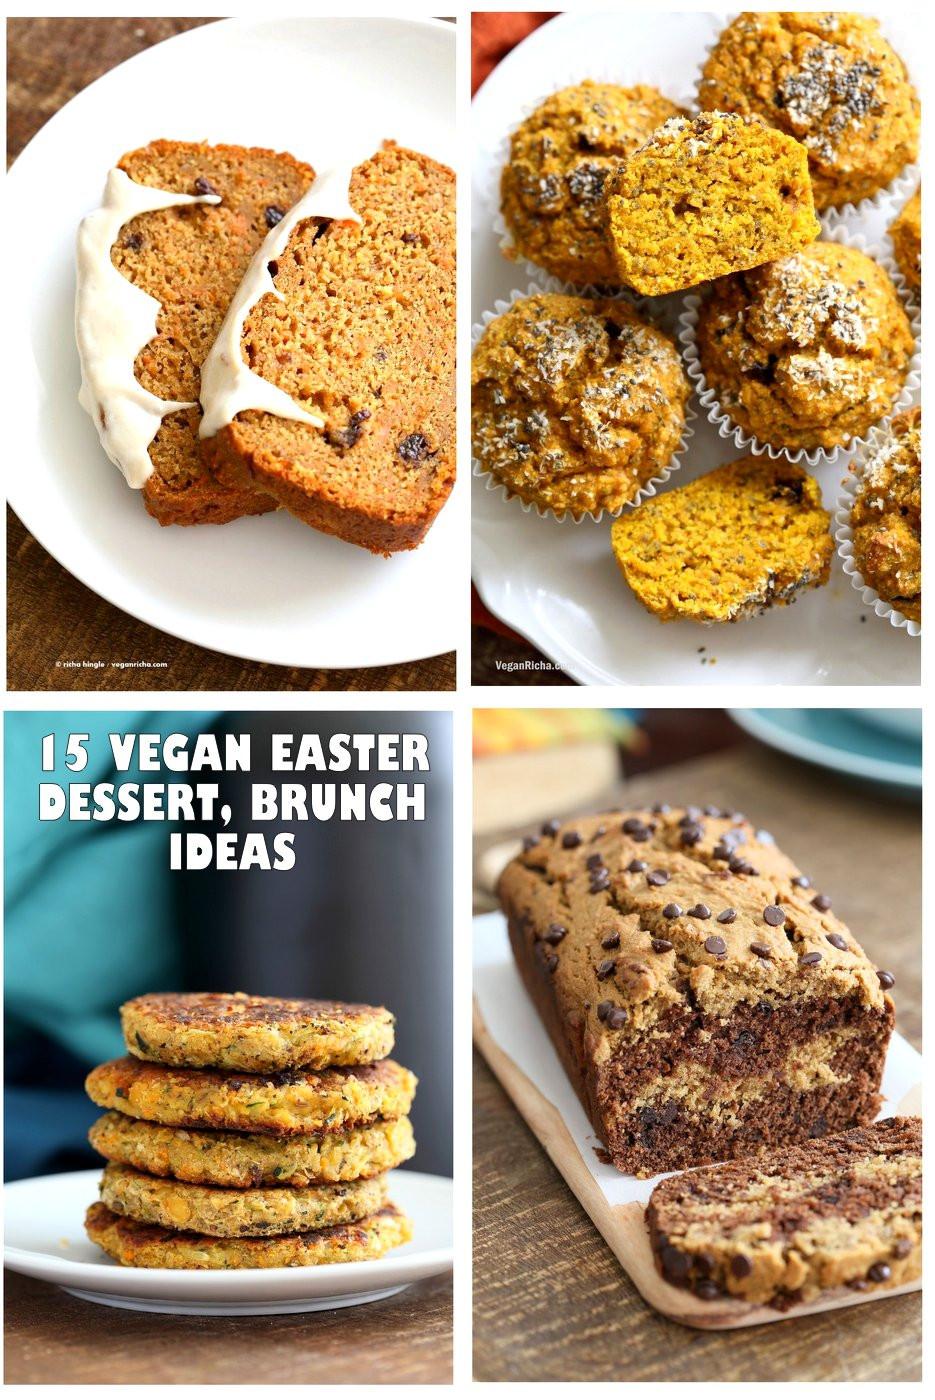 Vegan Easter Desserts 15 Vegan Easter Brunch and Dessert Recipes Vegan Richa